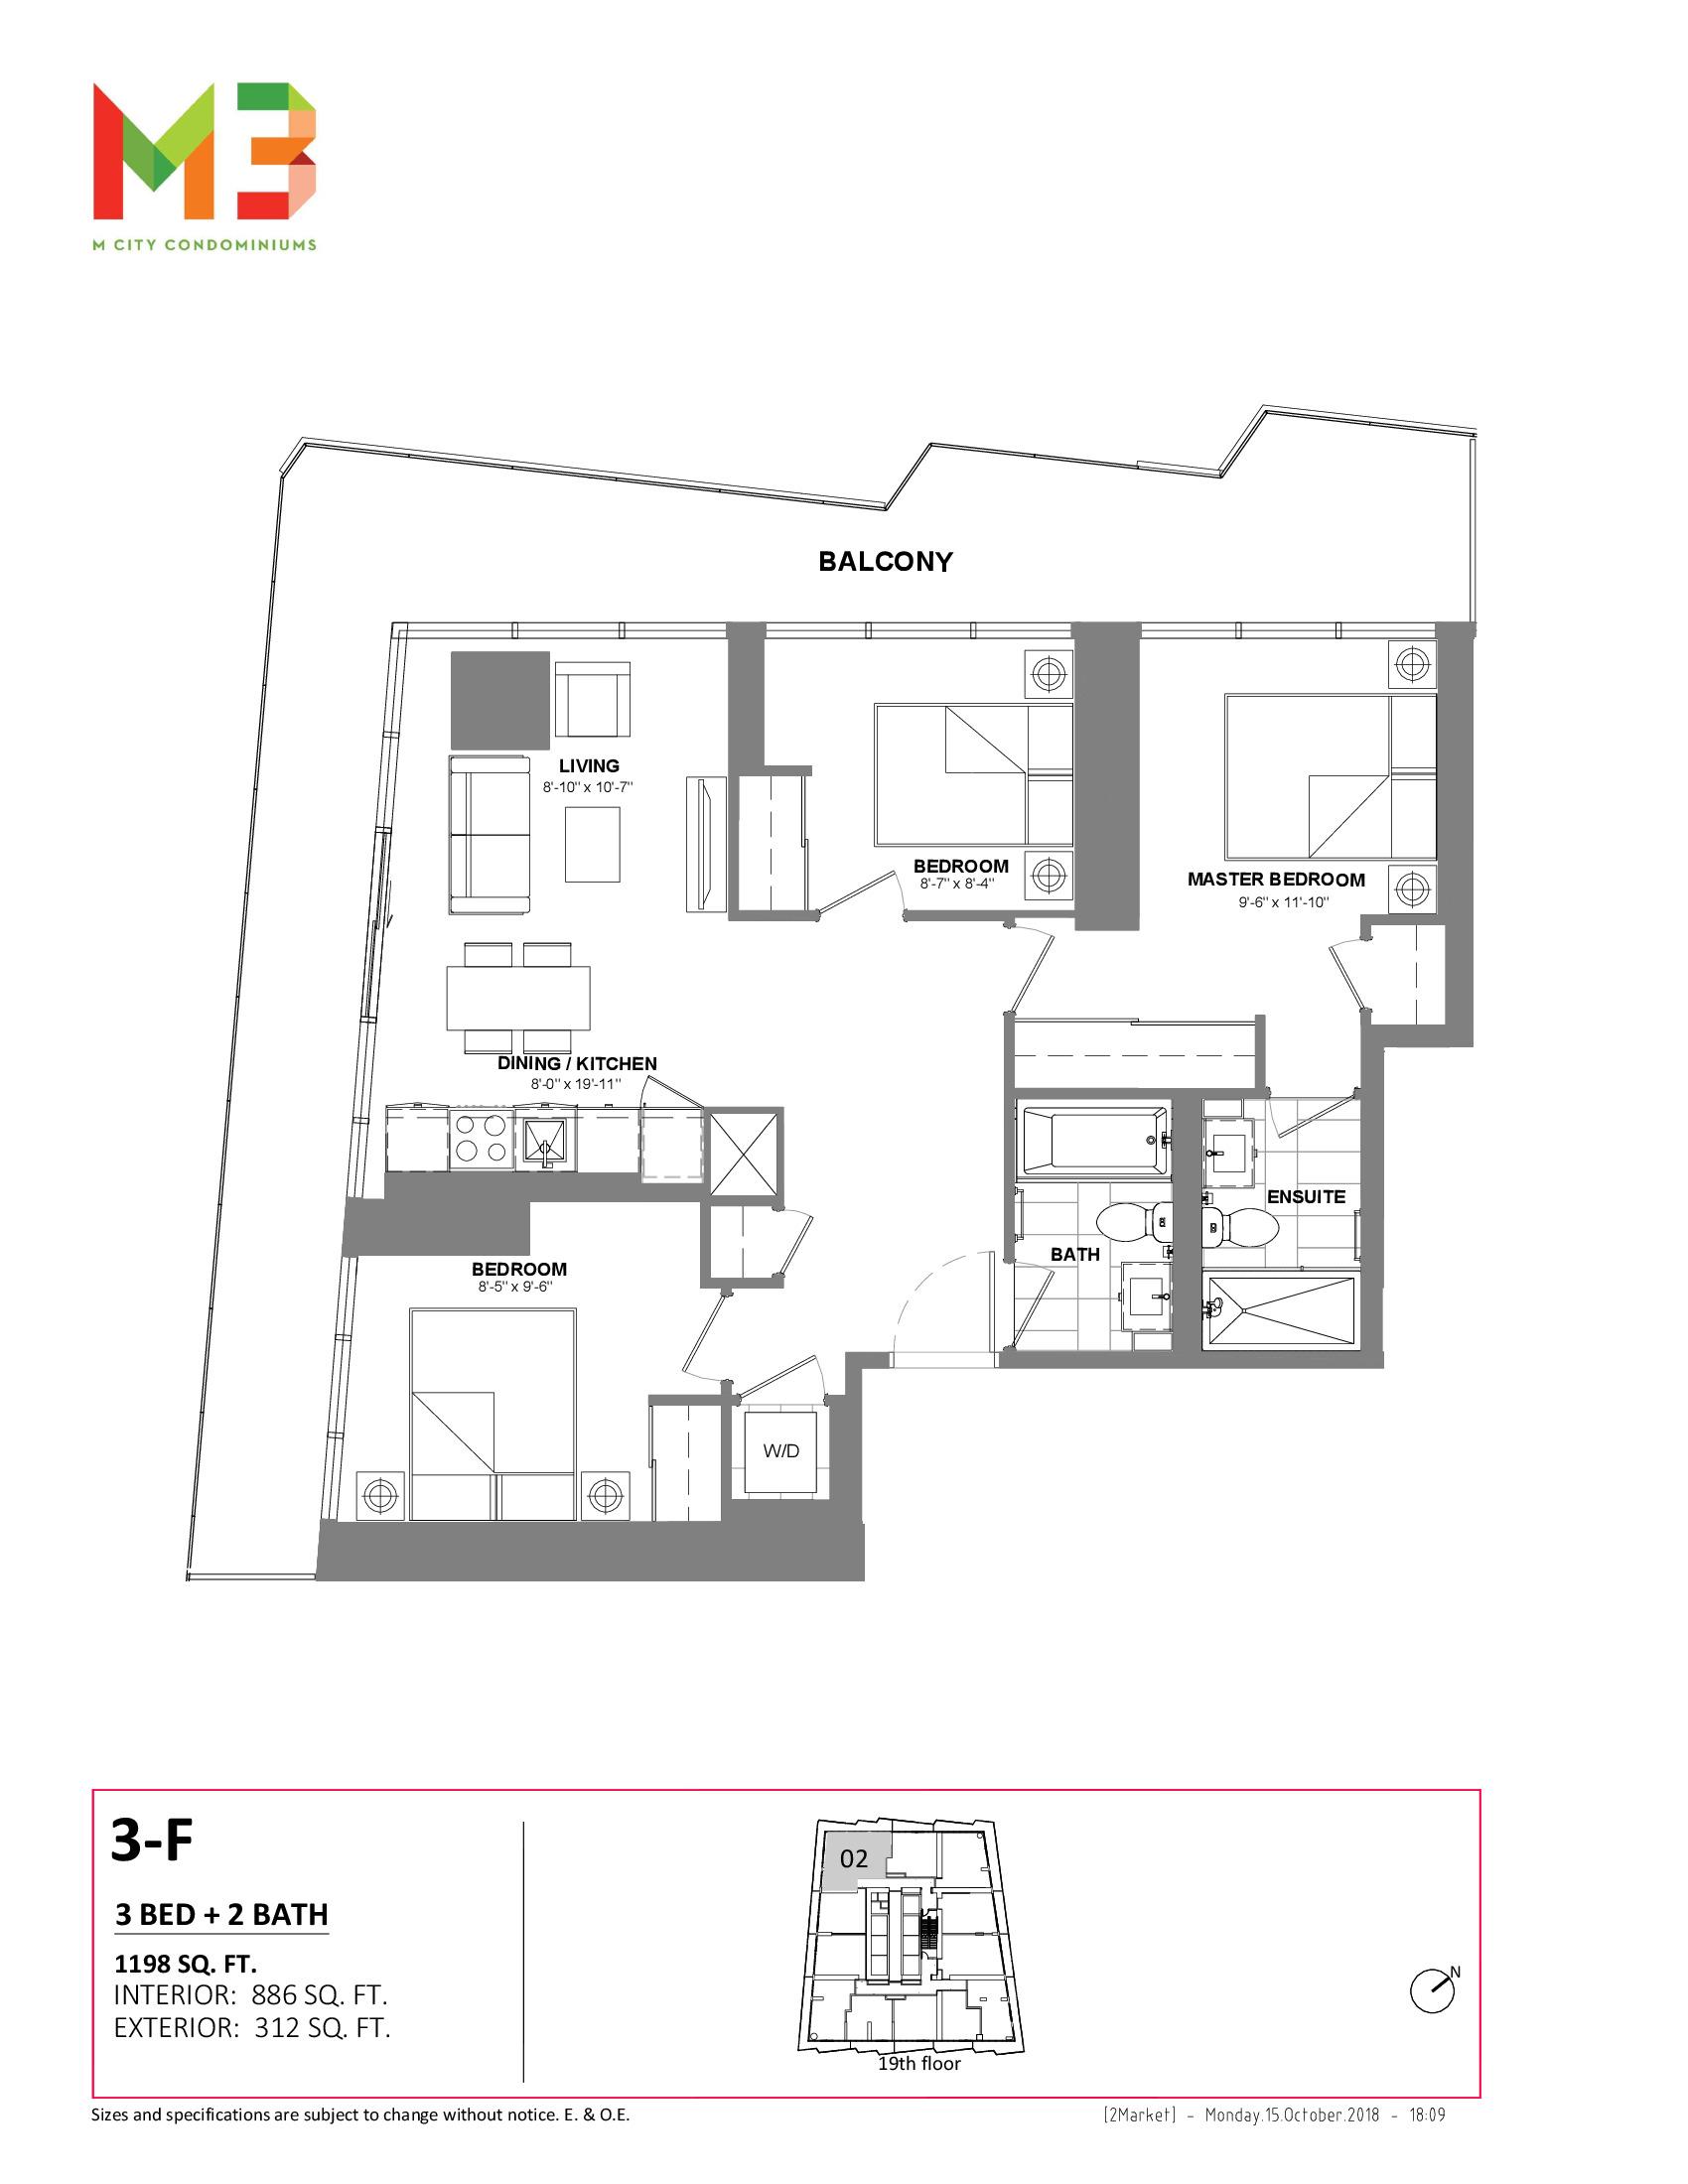 3-F Floor Plan at M3 Condos - 886 sq.ft